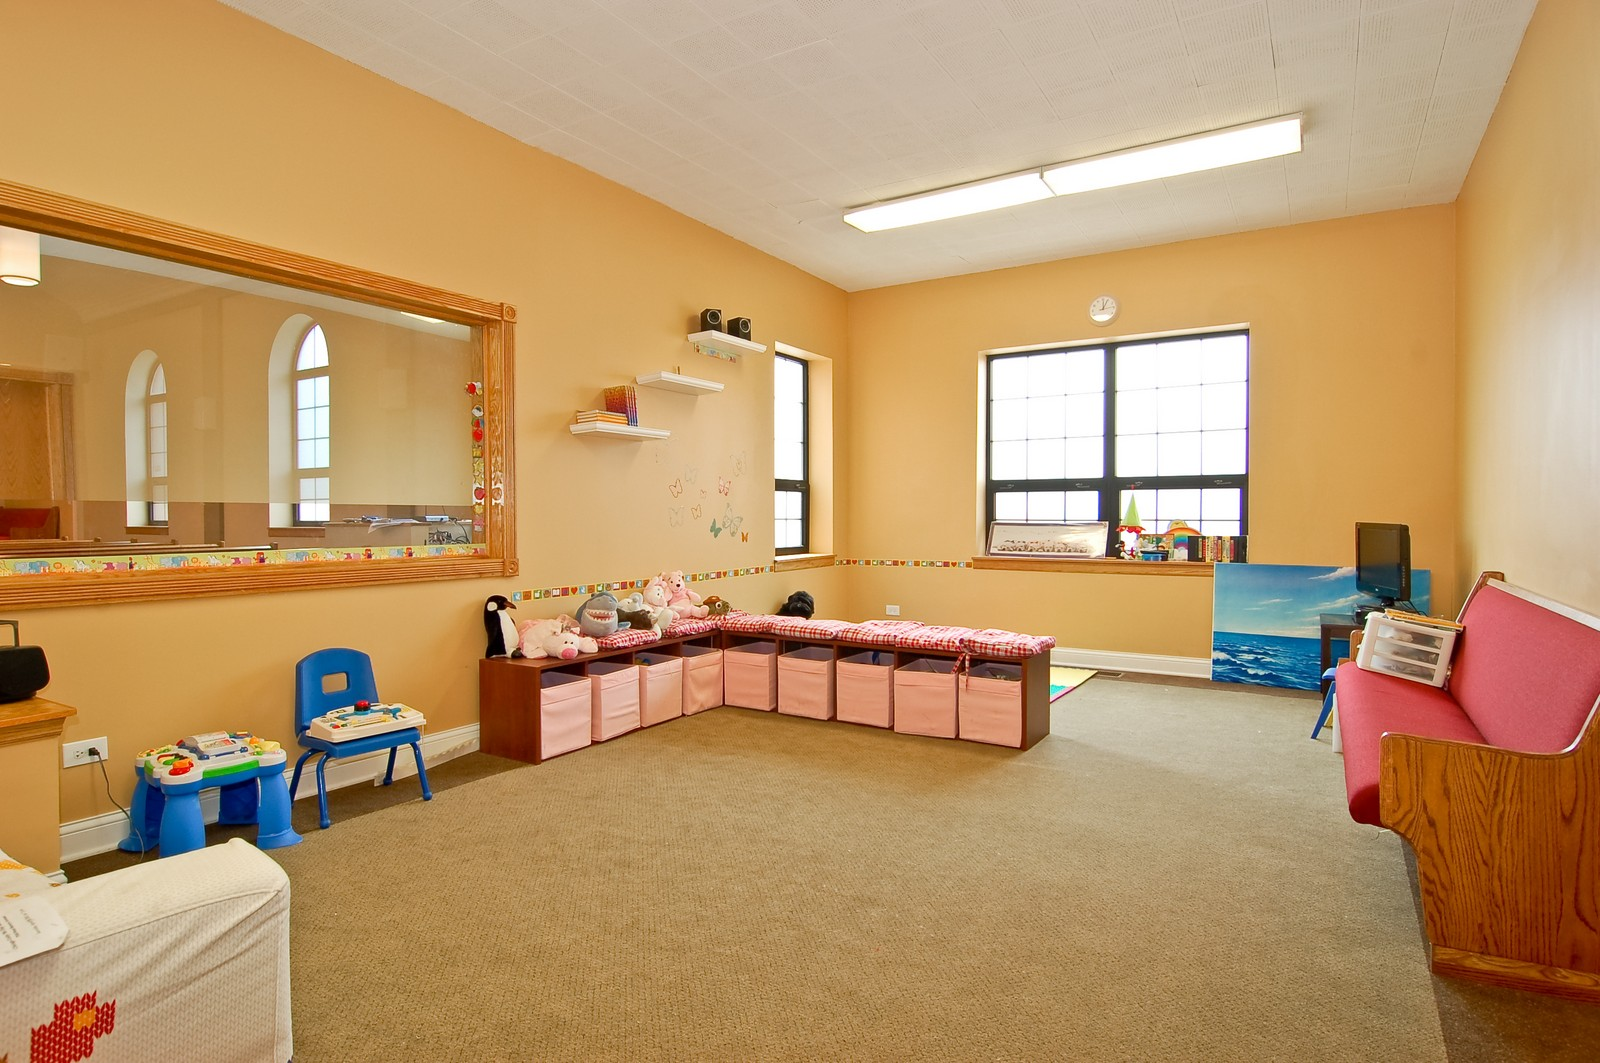 Real Estate Photography - 7534 W Berwyn Ave, Chicago, IL, 60656 - Nursery/Playroom